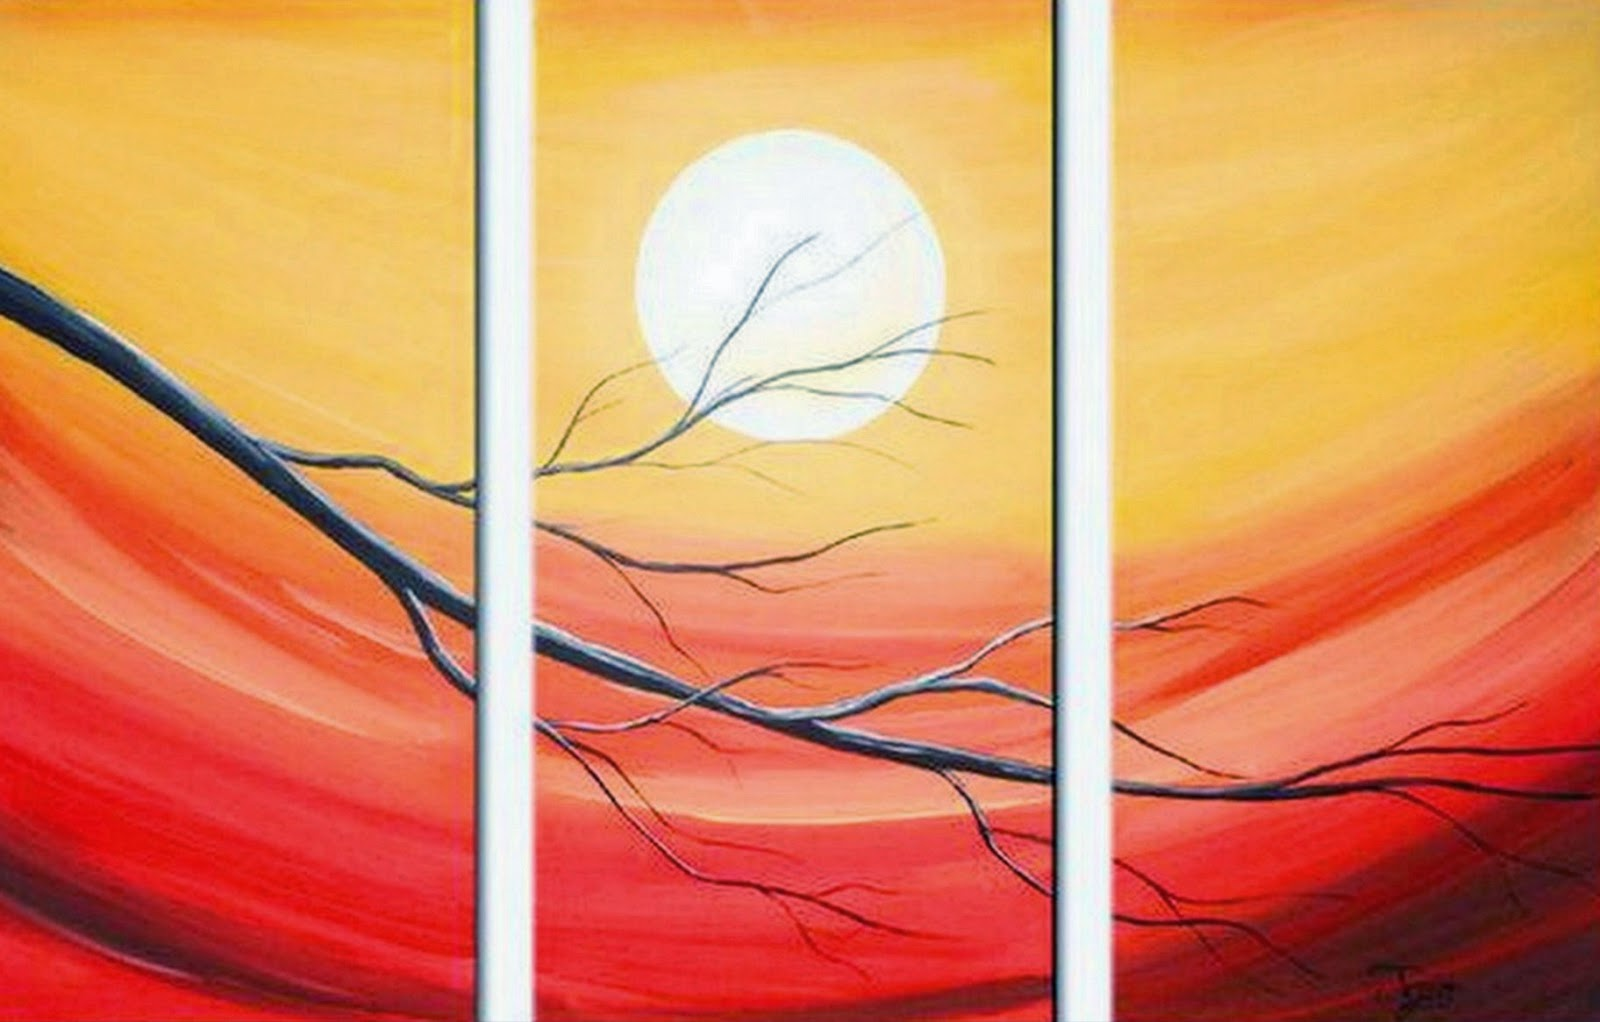 Cuadros modernos pinturas y dibujos 02 17 15 - Pintura cuadros modernos ...